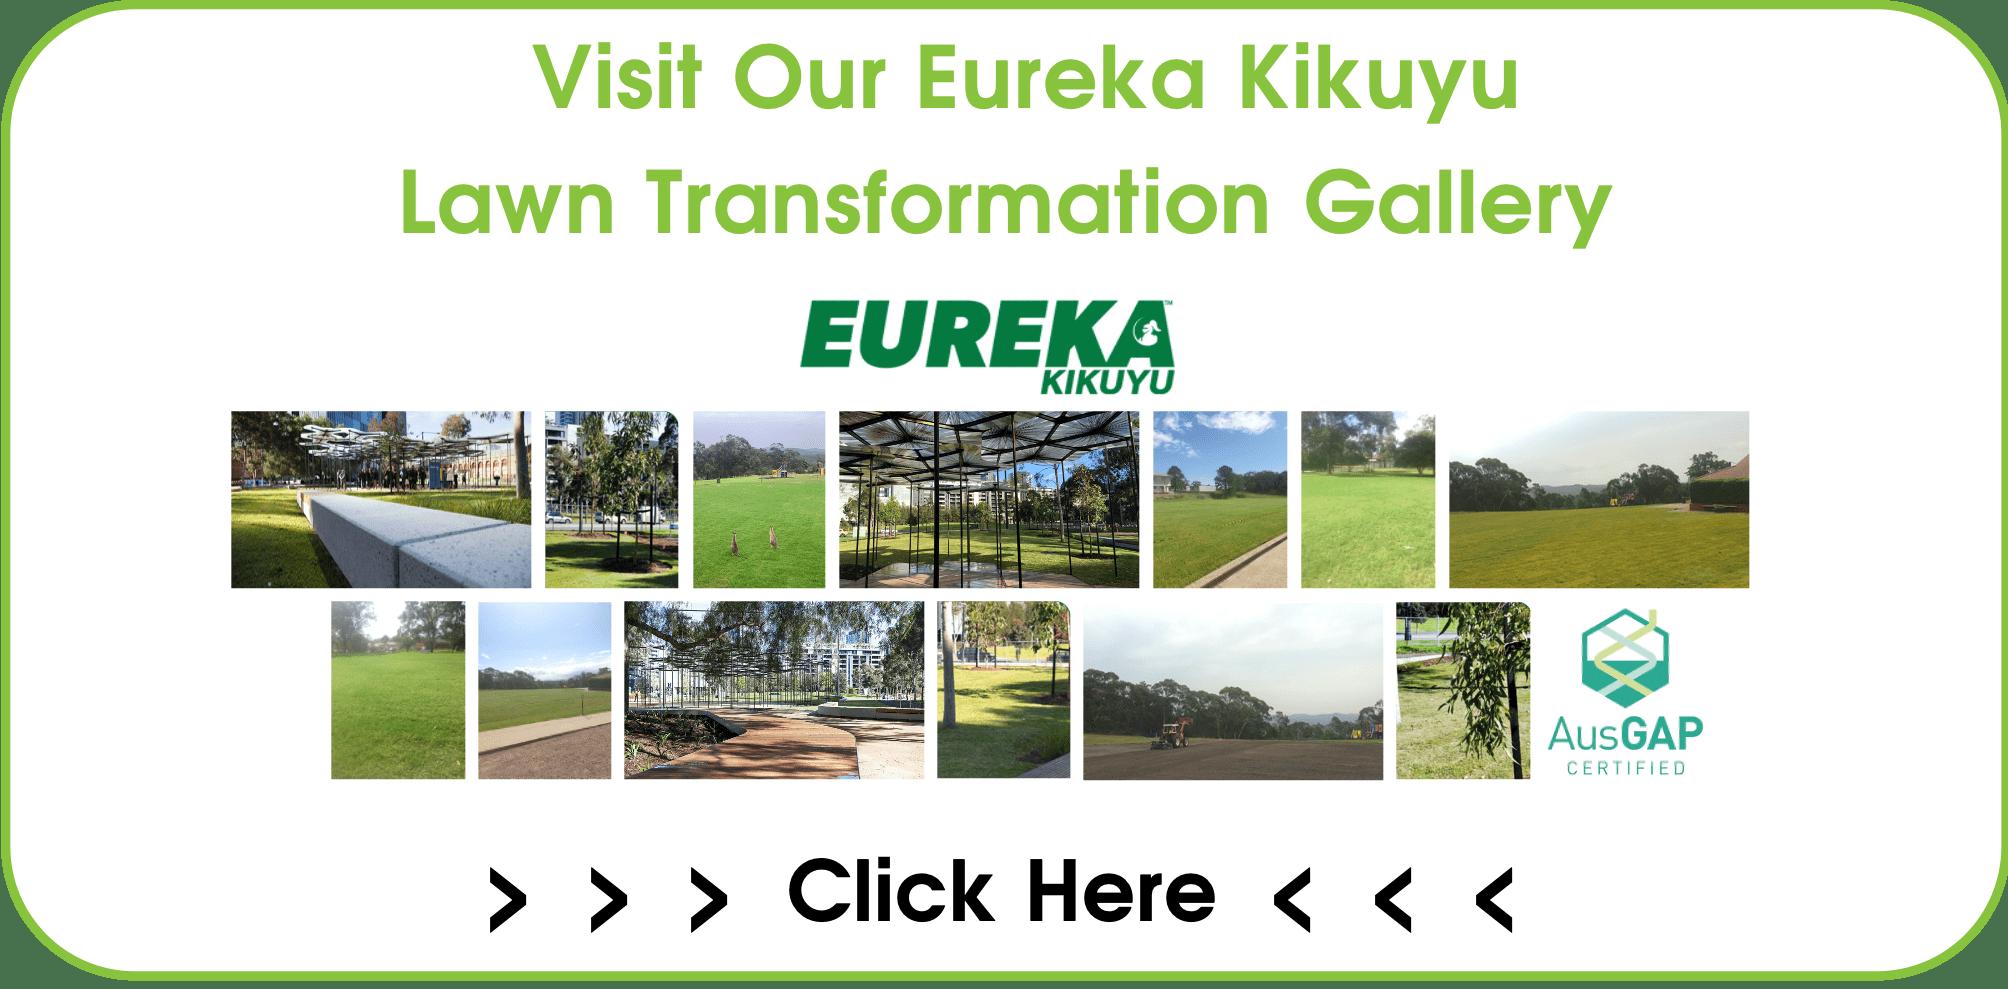 CTA Eureka Kikuyu Lawn Transformation Gallery Page-min